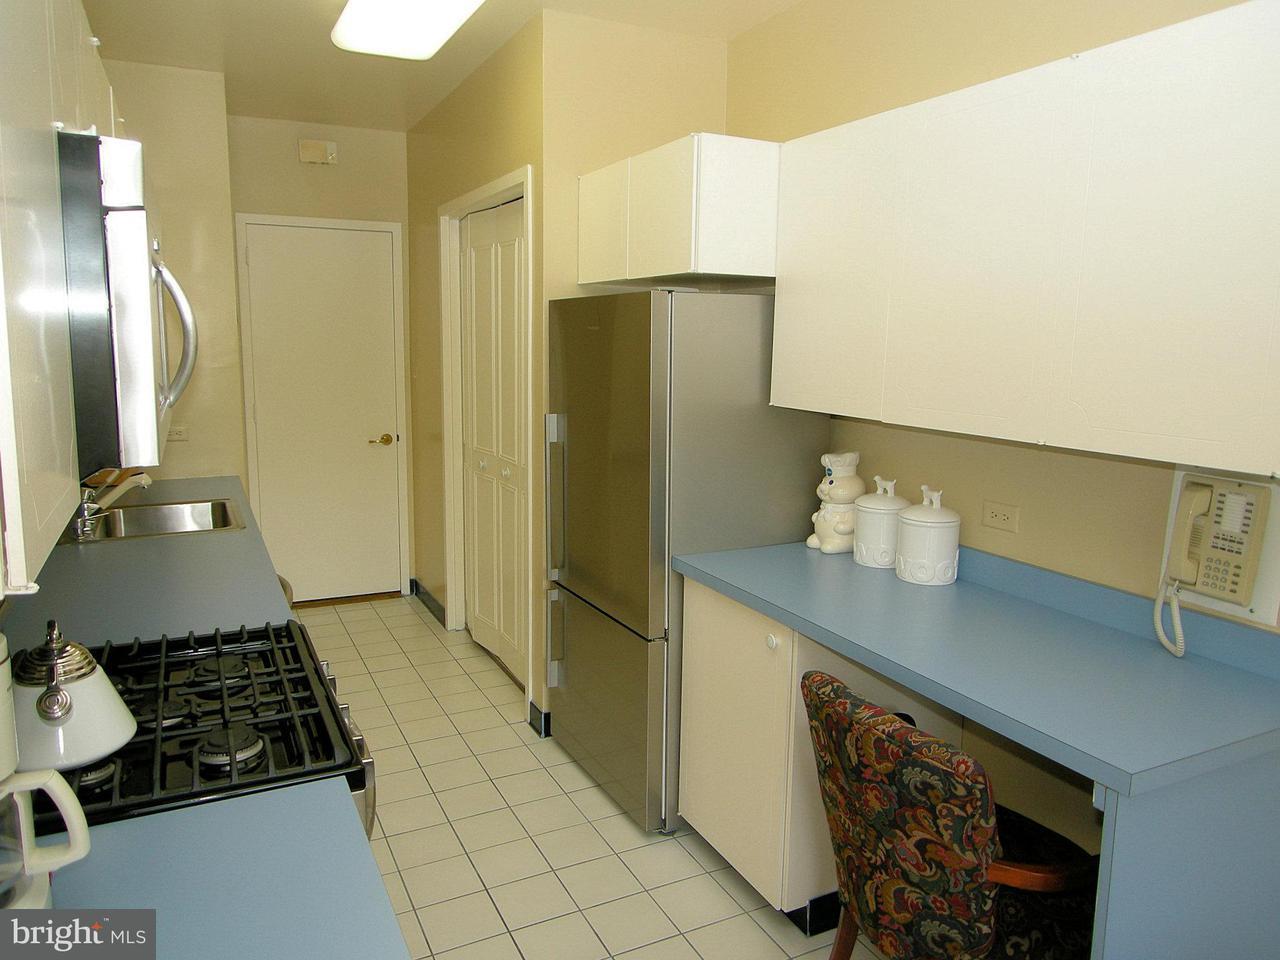 Additional photo for property listing at 2801 New Mexico Ave Nw #912 2801 New Mexico Ave Nw #912 Washington, Περιφερεια Τησ Κολουμπια 20007 Ηνωμενεσ Πολιτειεσ